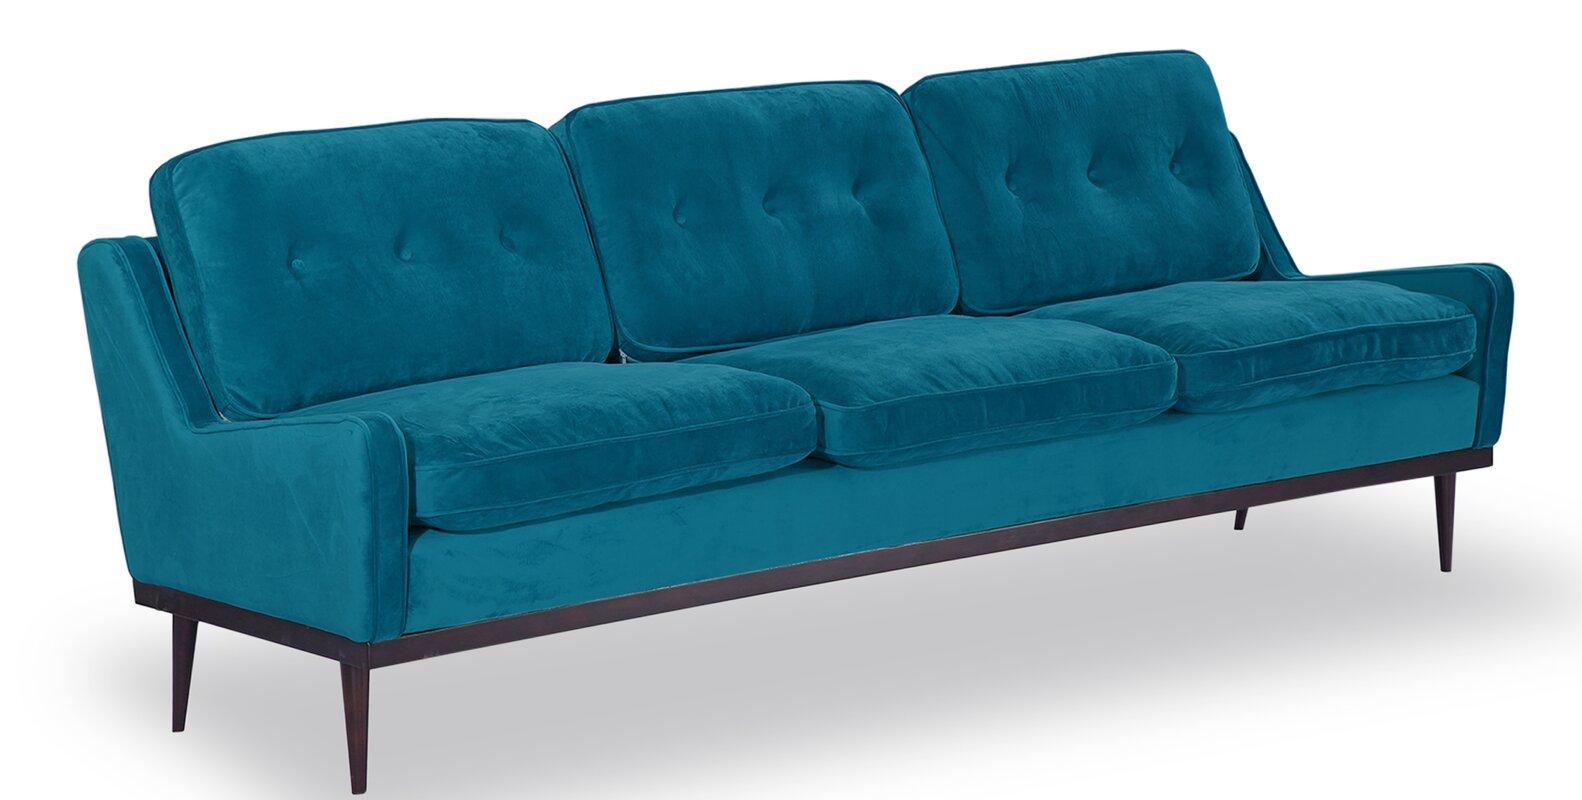 Agustin Midcentury Modern Sofa